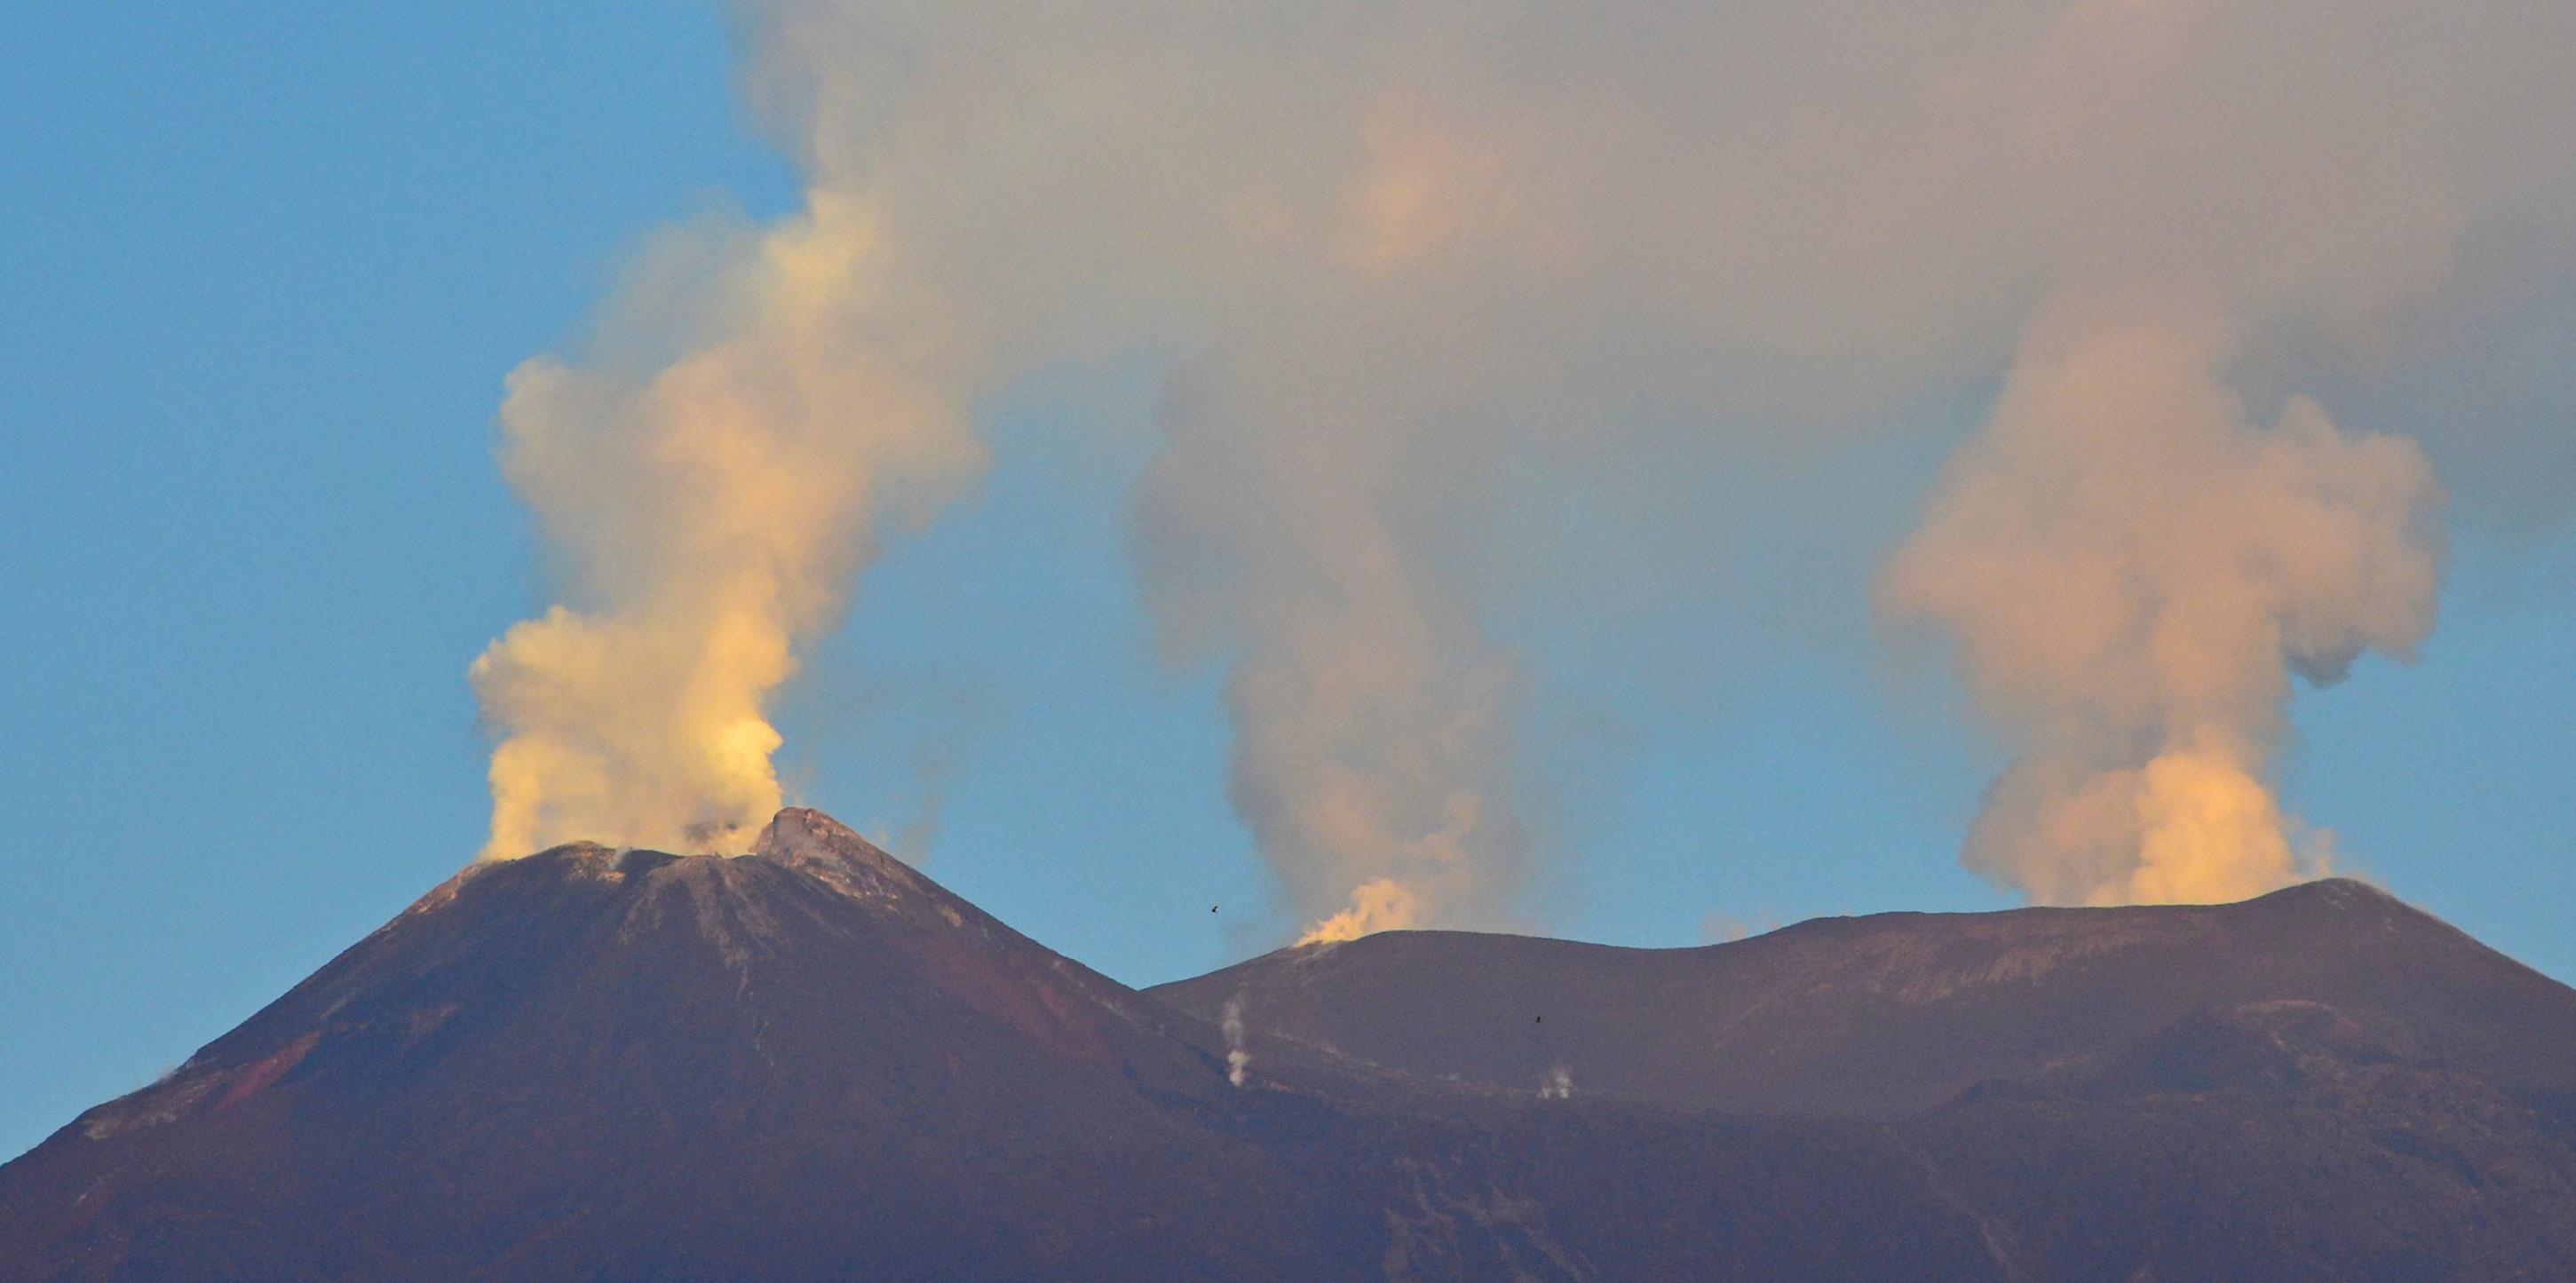 August 26, 2019. EN. Japan : Asama , Italy / Sicily : Etna , Kamchatka : Sheveluch , New Zealand : Ruapehu , Ecuador : Reventador .